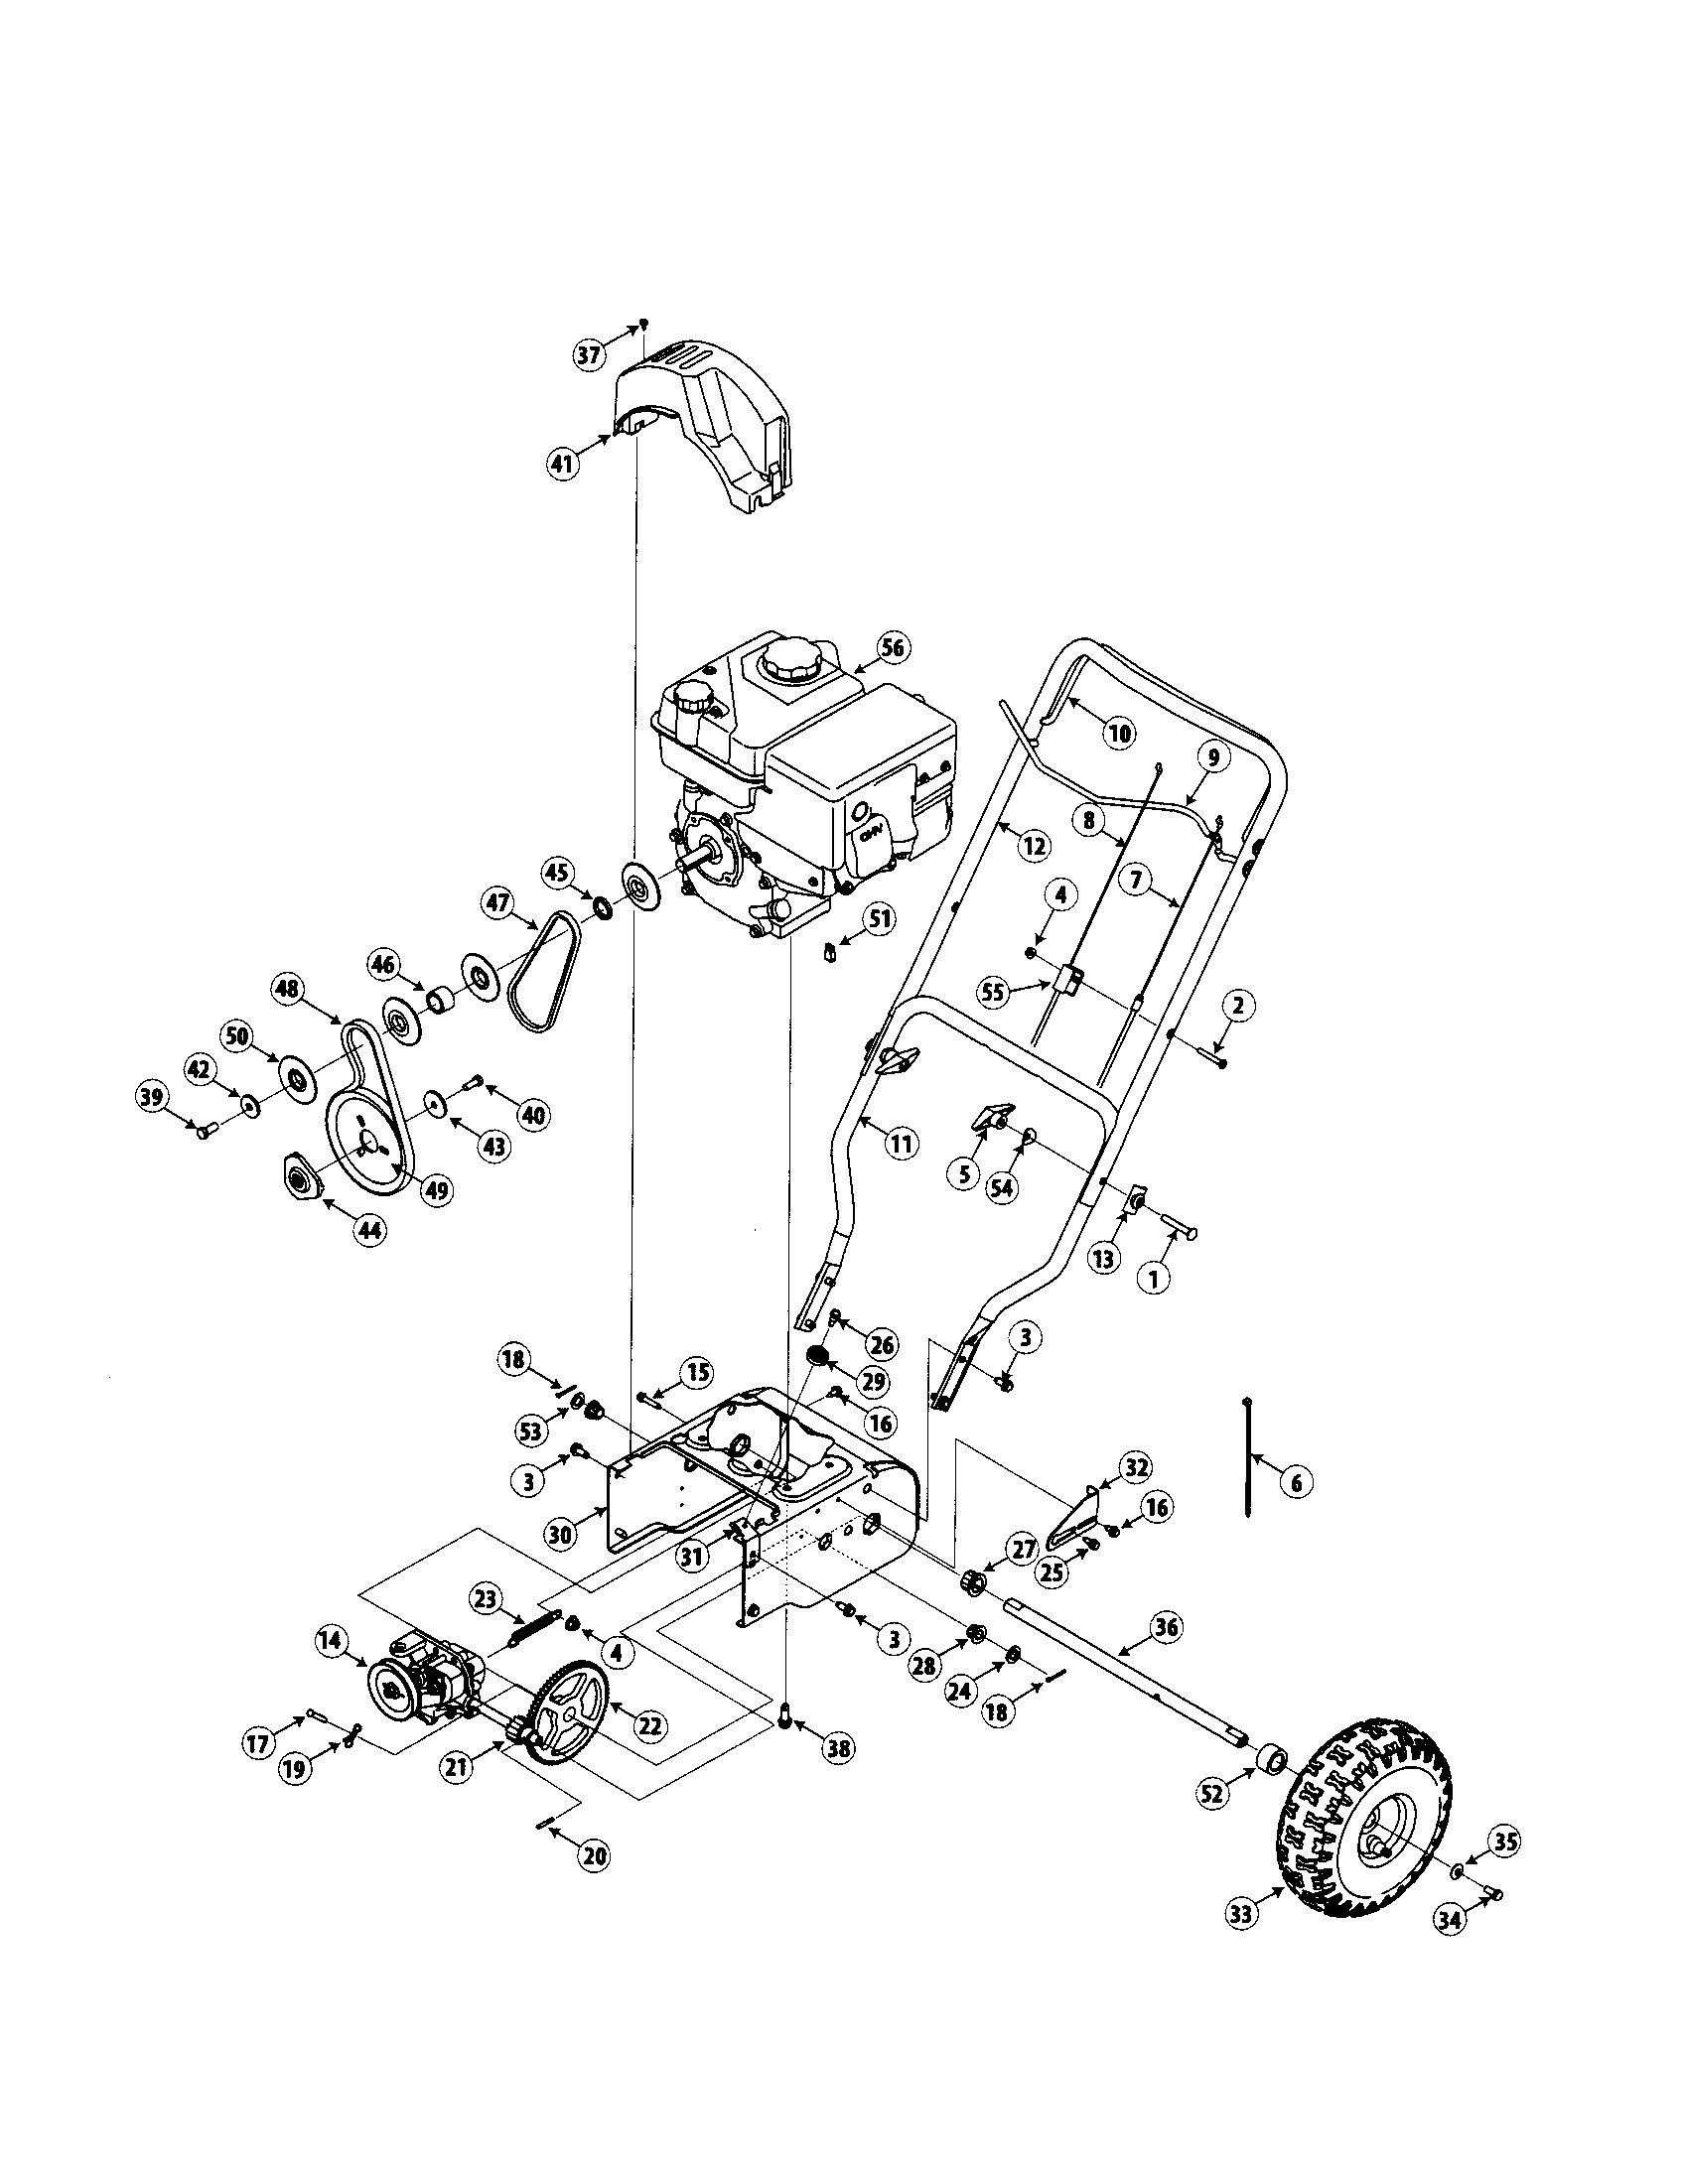 ENGINE/HANDLE/WHEELS Diagram & Parts List for Model